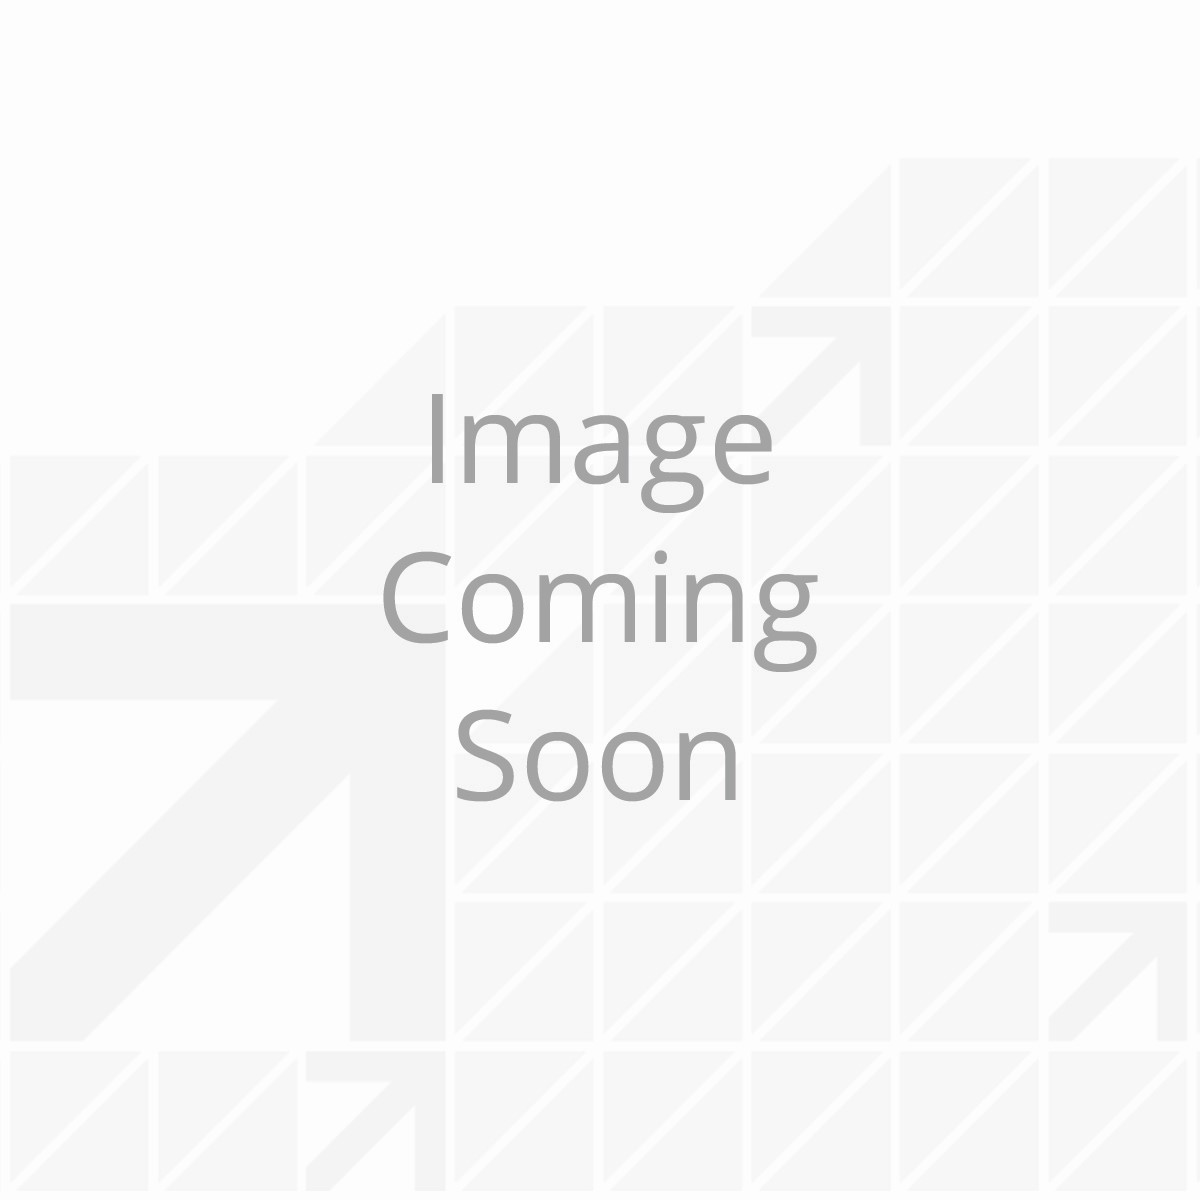 6-Way Round Connector Plug (Trailer Side, Chrome Plastic)